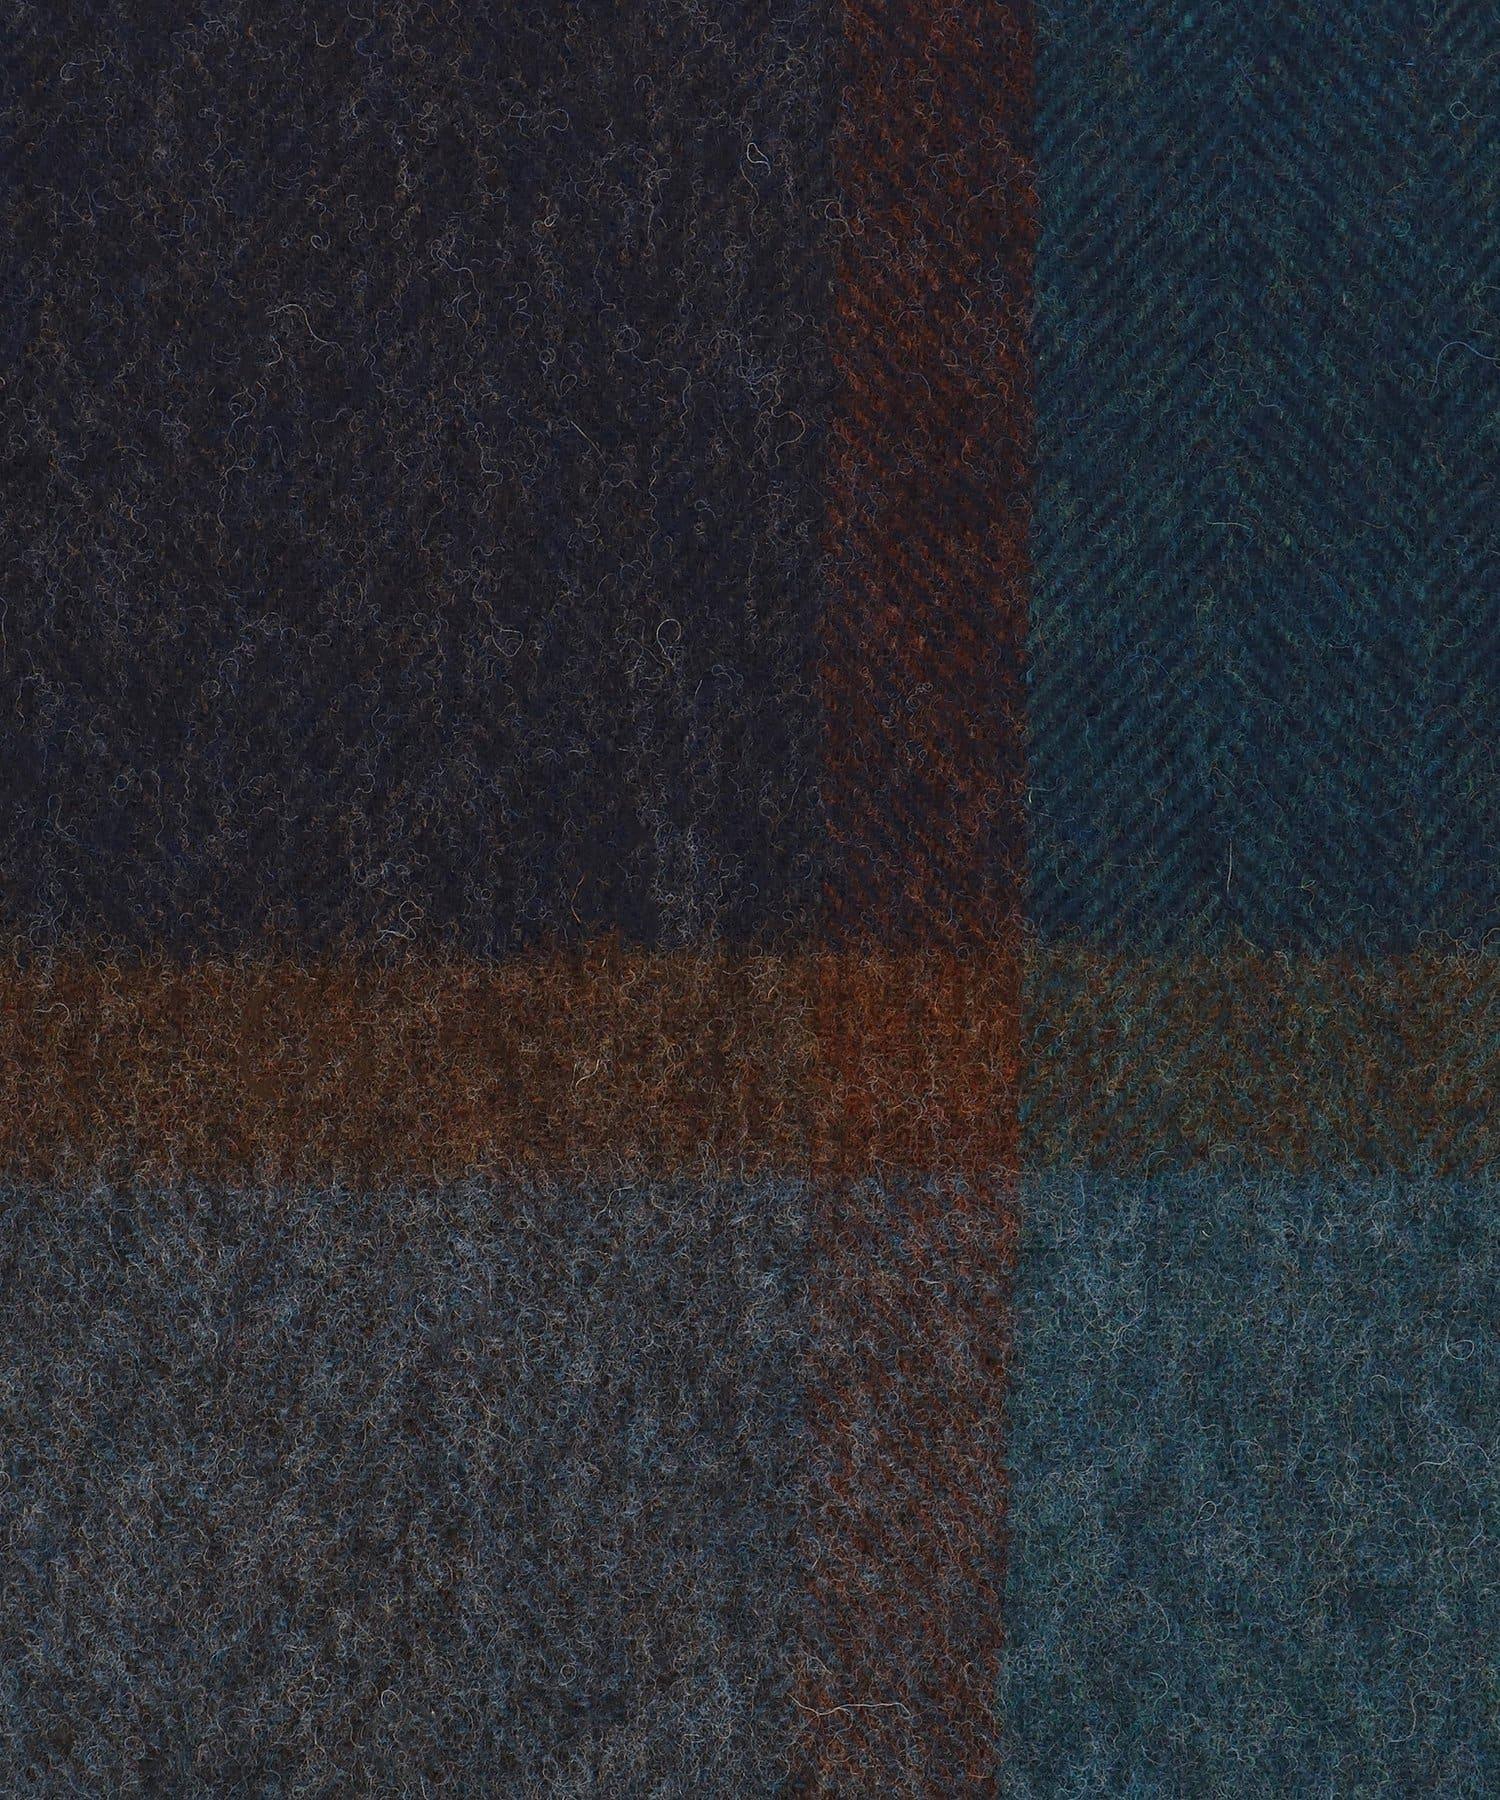 Loungedress(ラウンジドレス) 【BRONTE BY MOON/ブロンテバイムーン】チェックストール